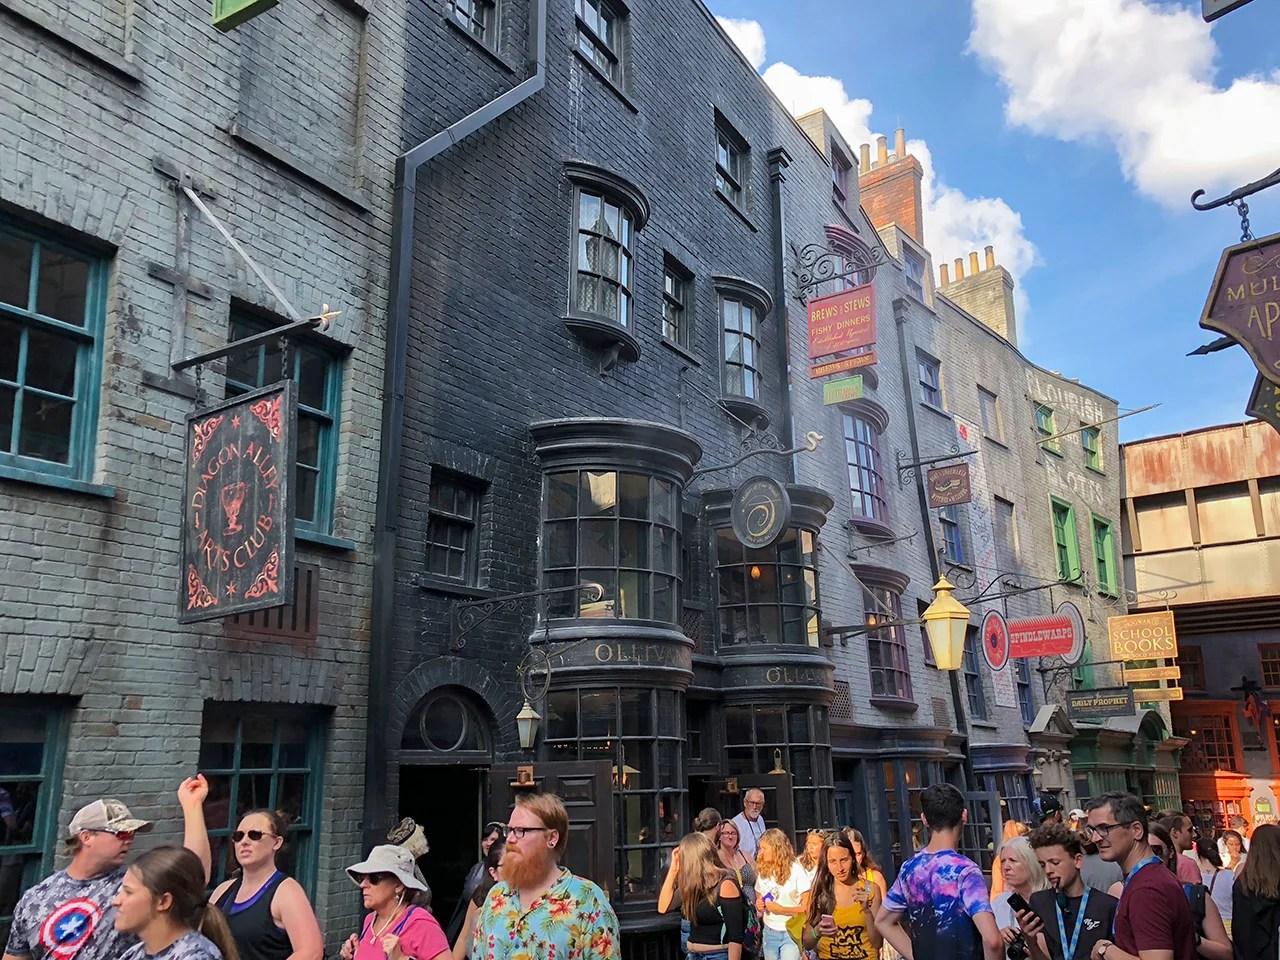 Review Of Universal Studios Orlando Vip Tour